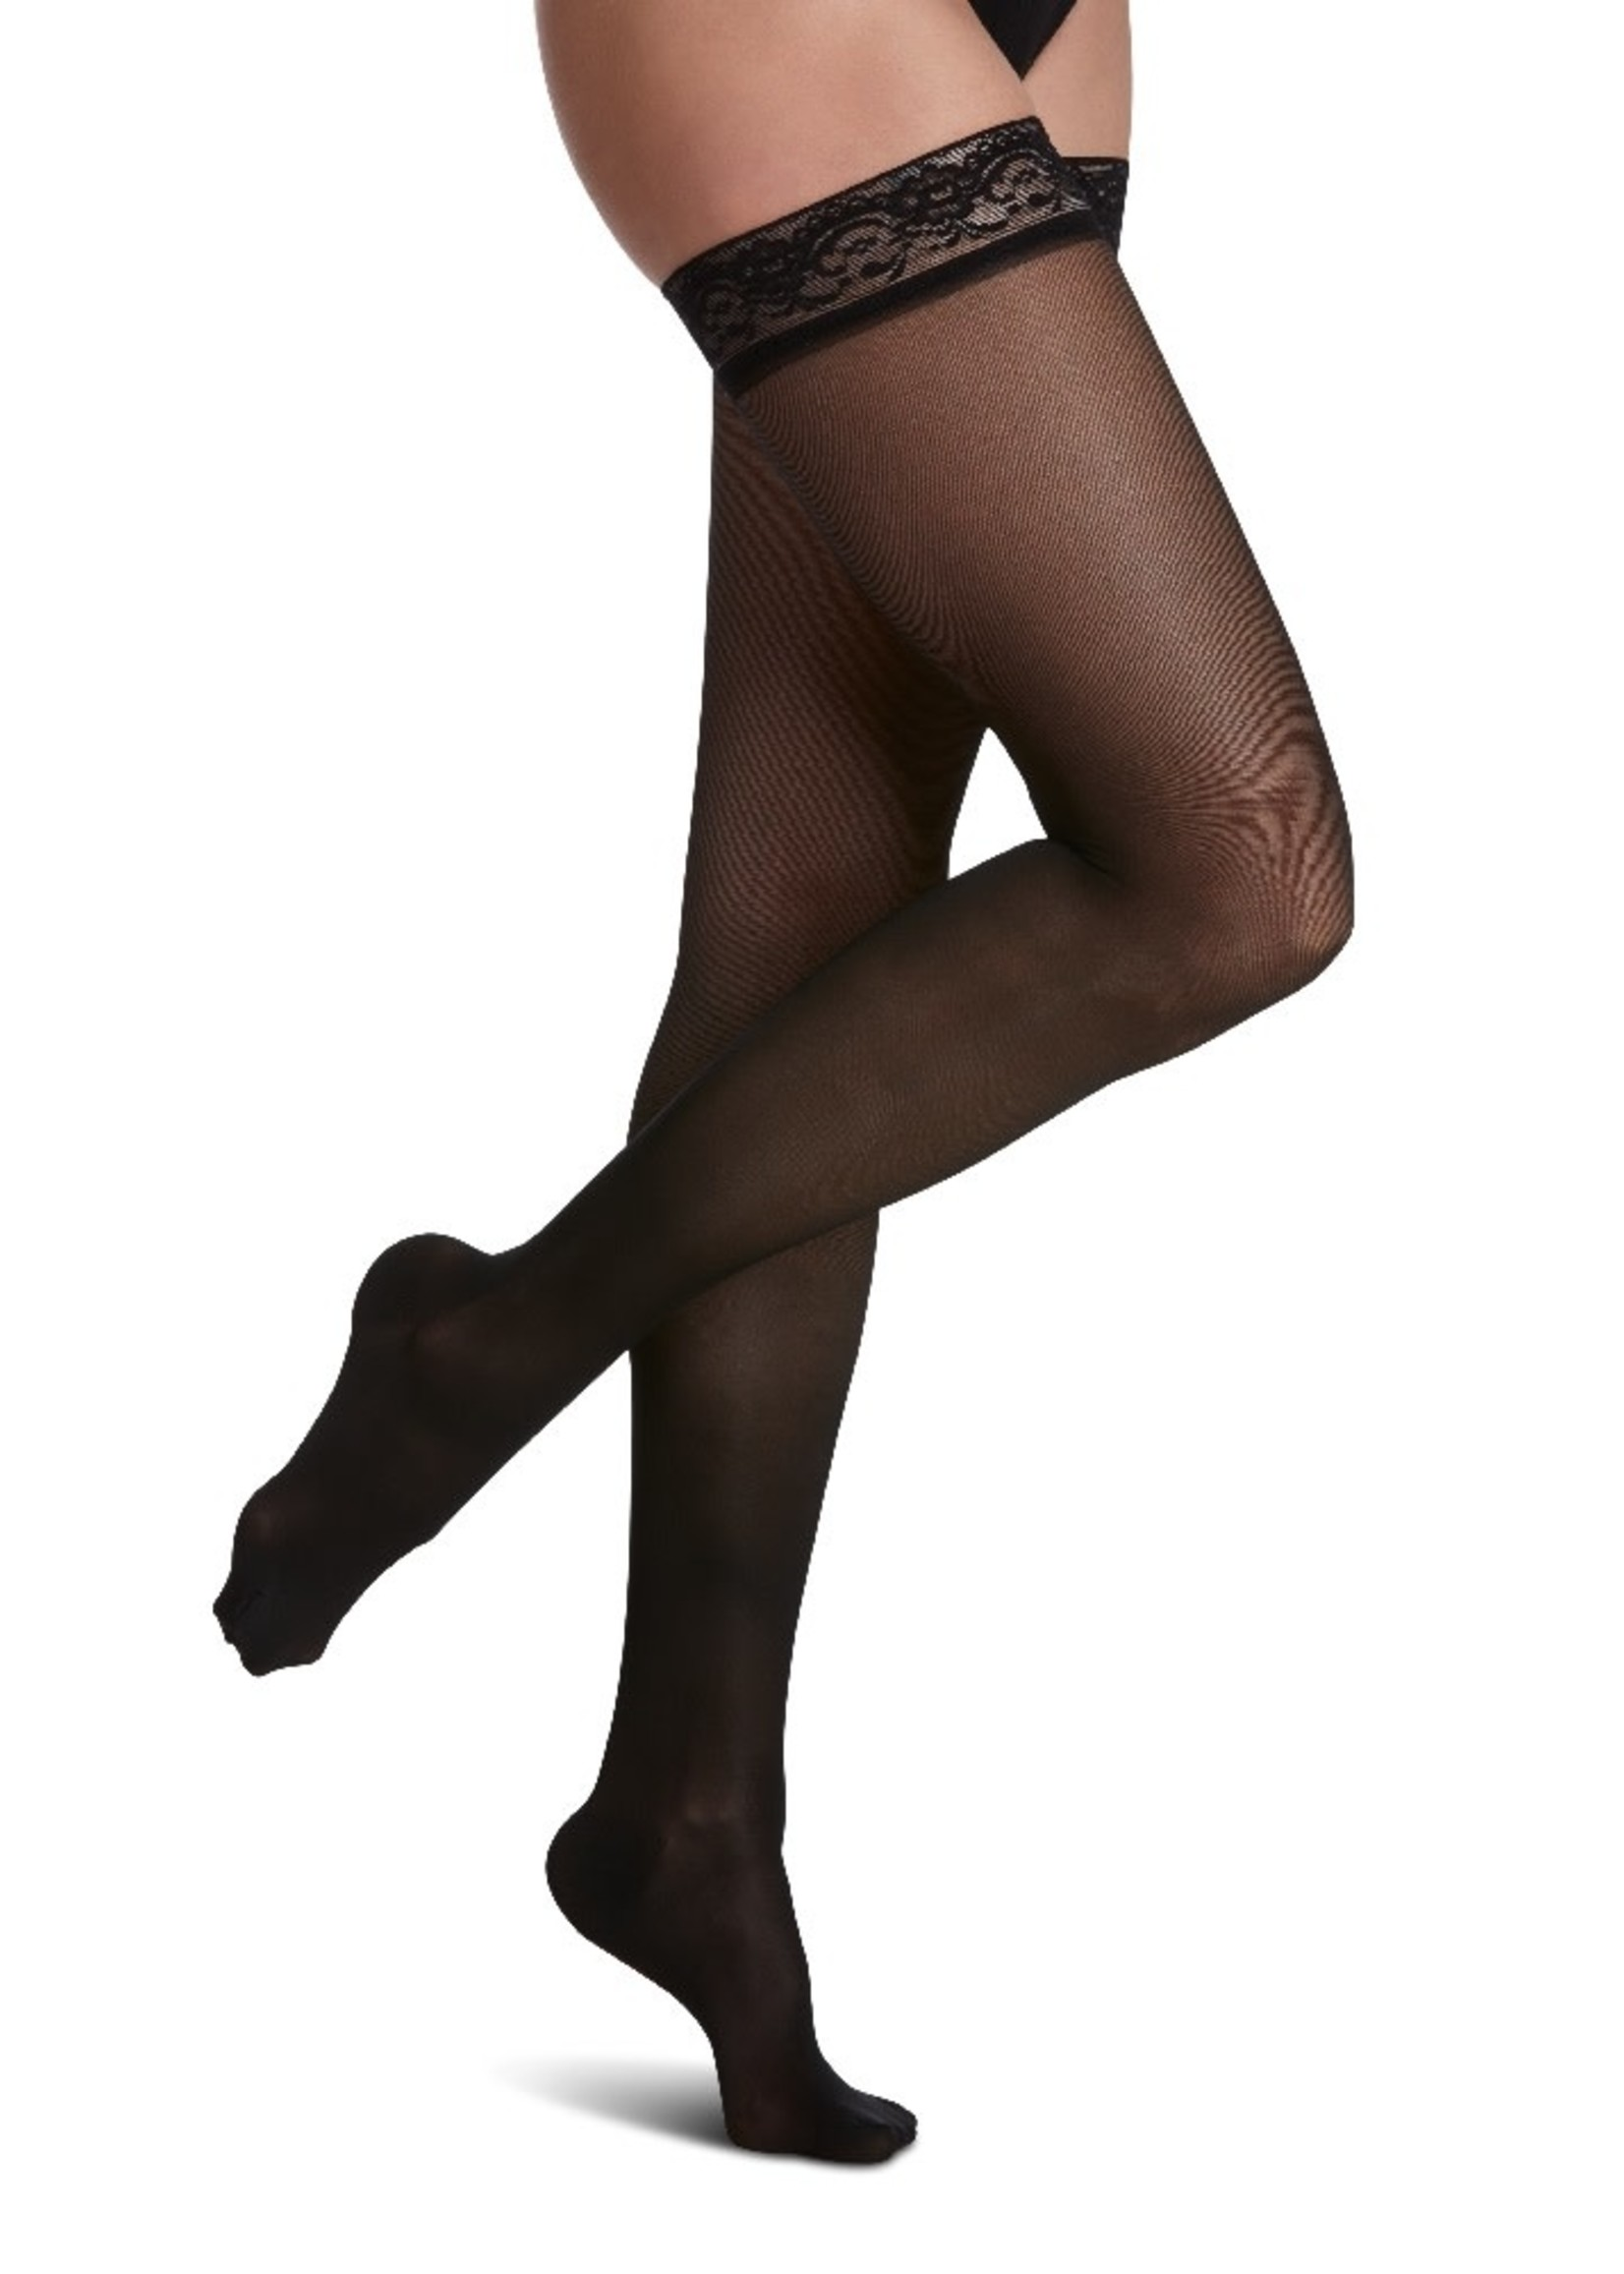 SIGVARIS Women's Sheer Fashion Thigh-High 15-20mmHg